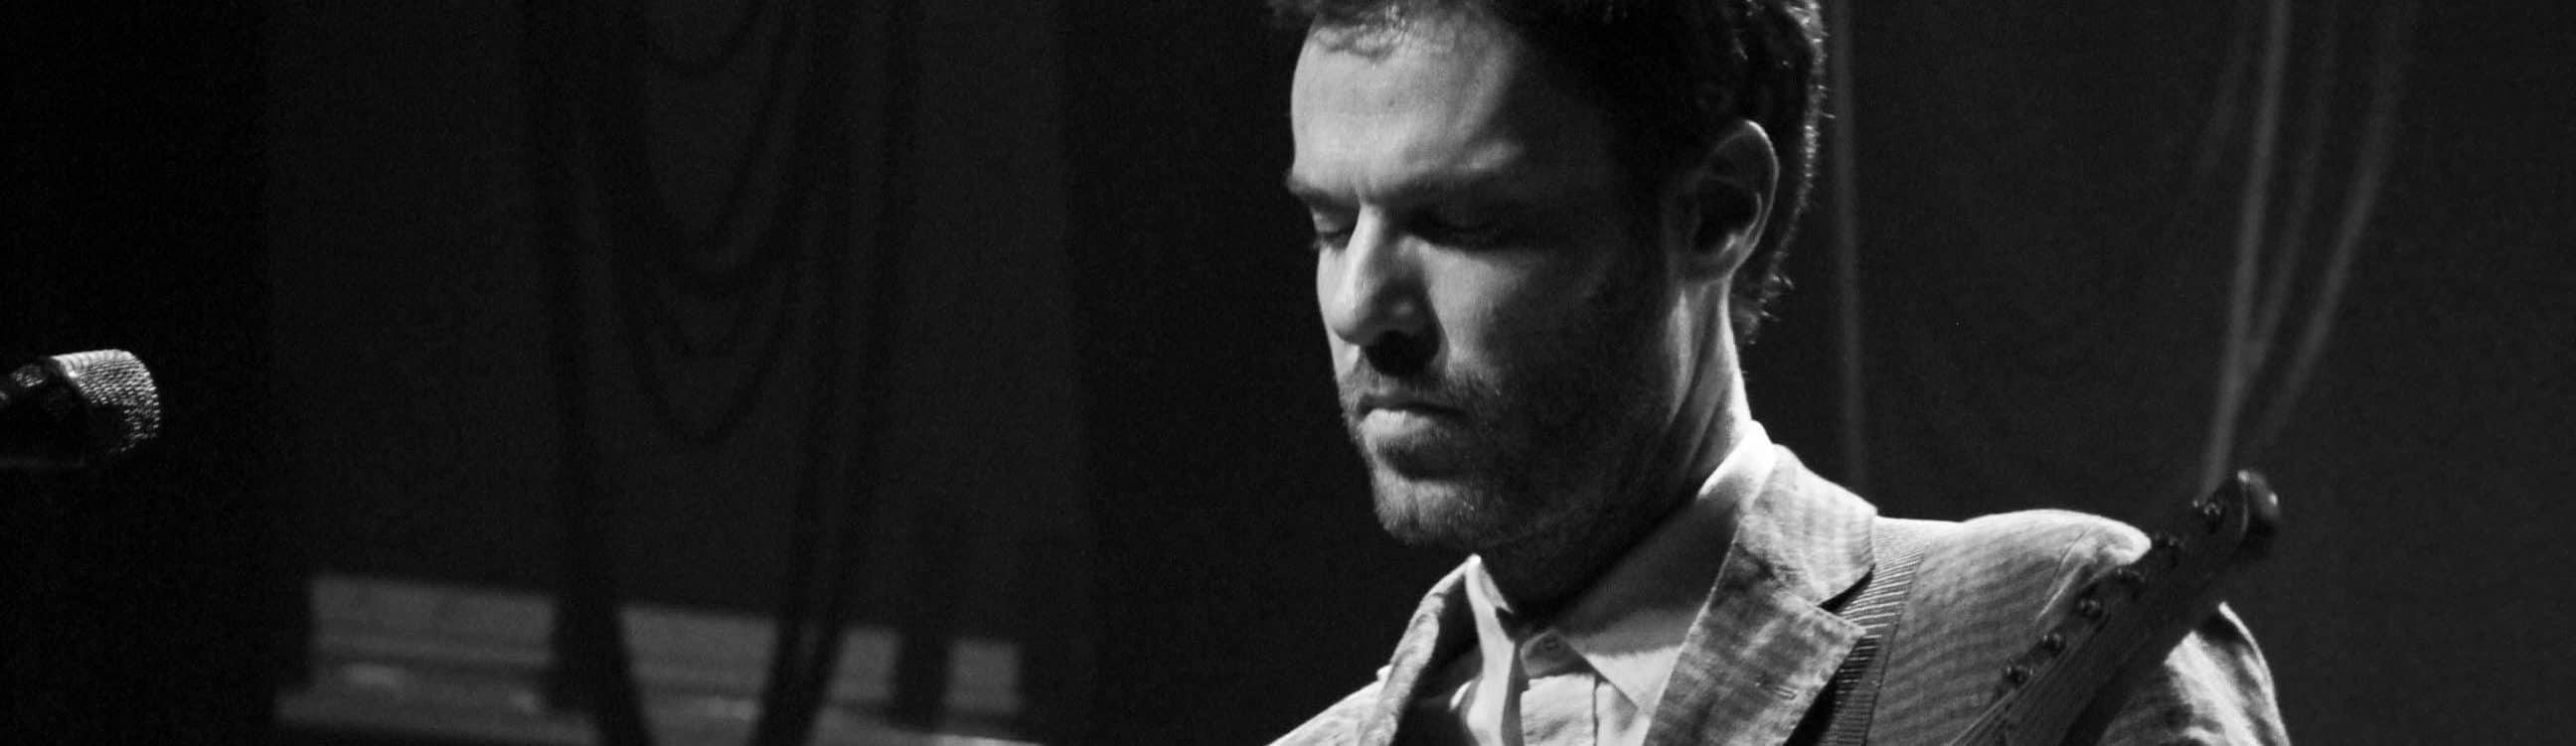 Piers Faccini guitare voix